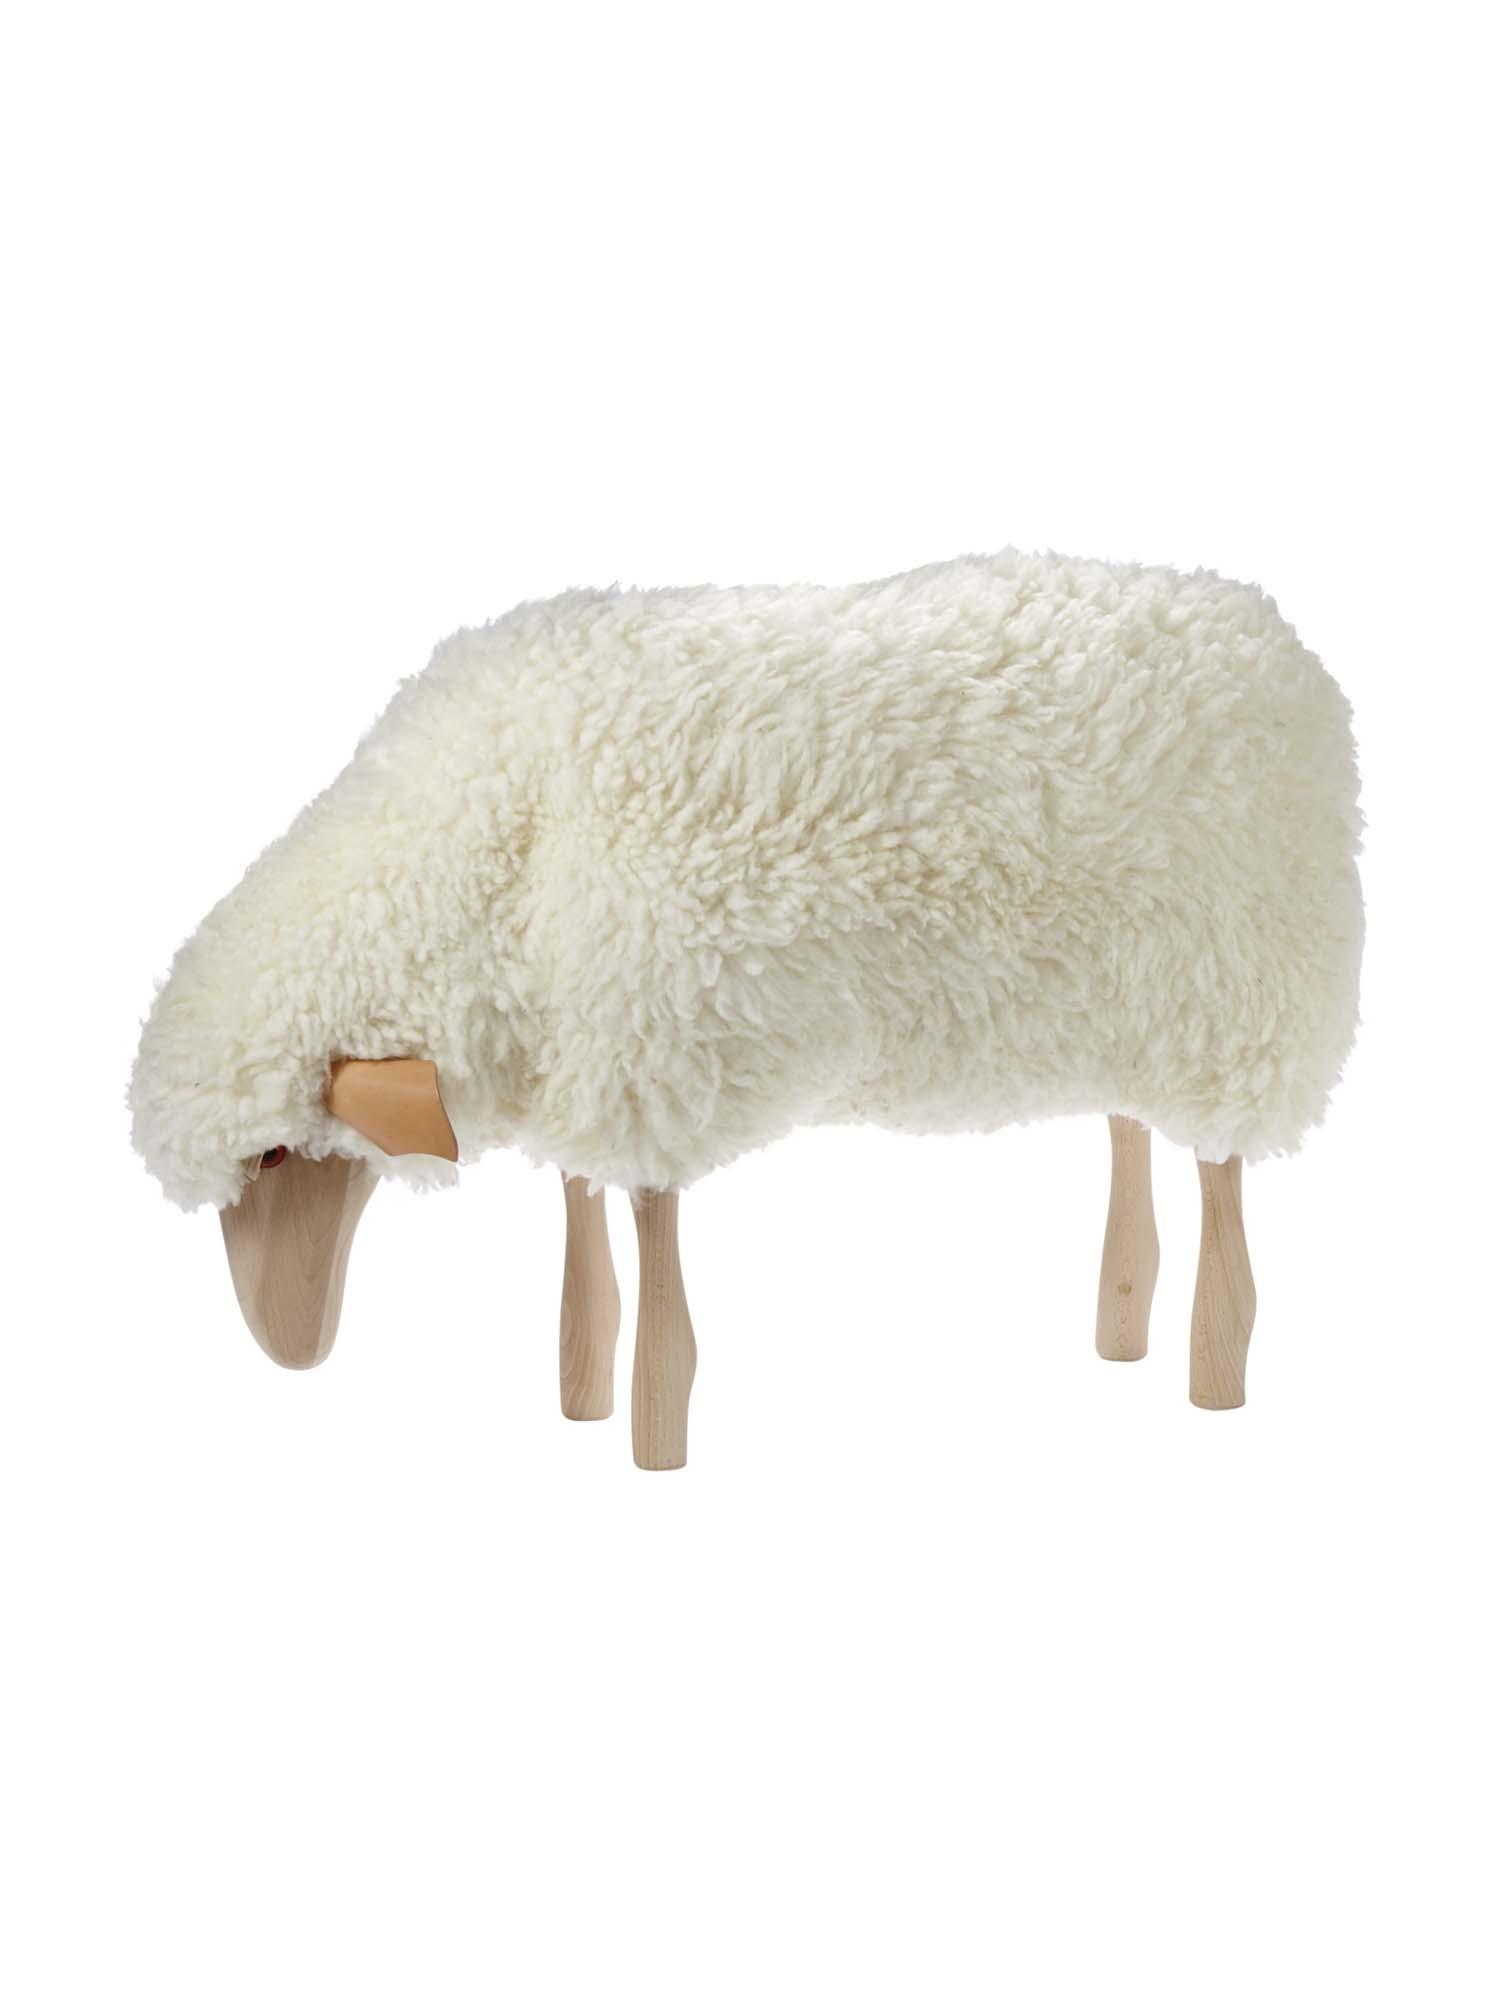 Grazing Sheep Stool Medium Nice Design